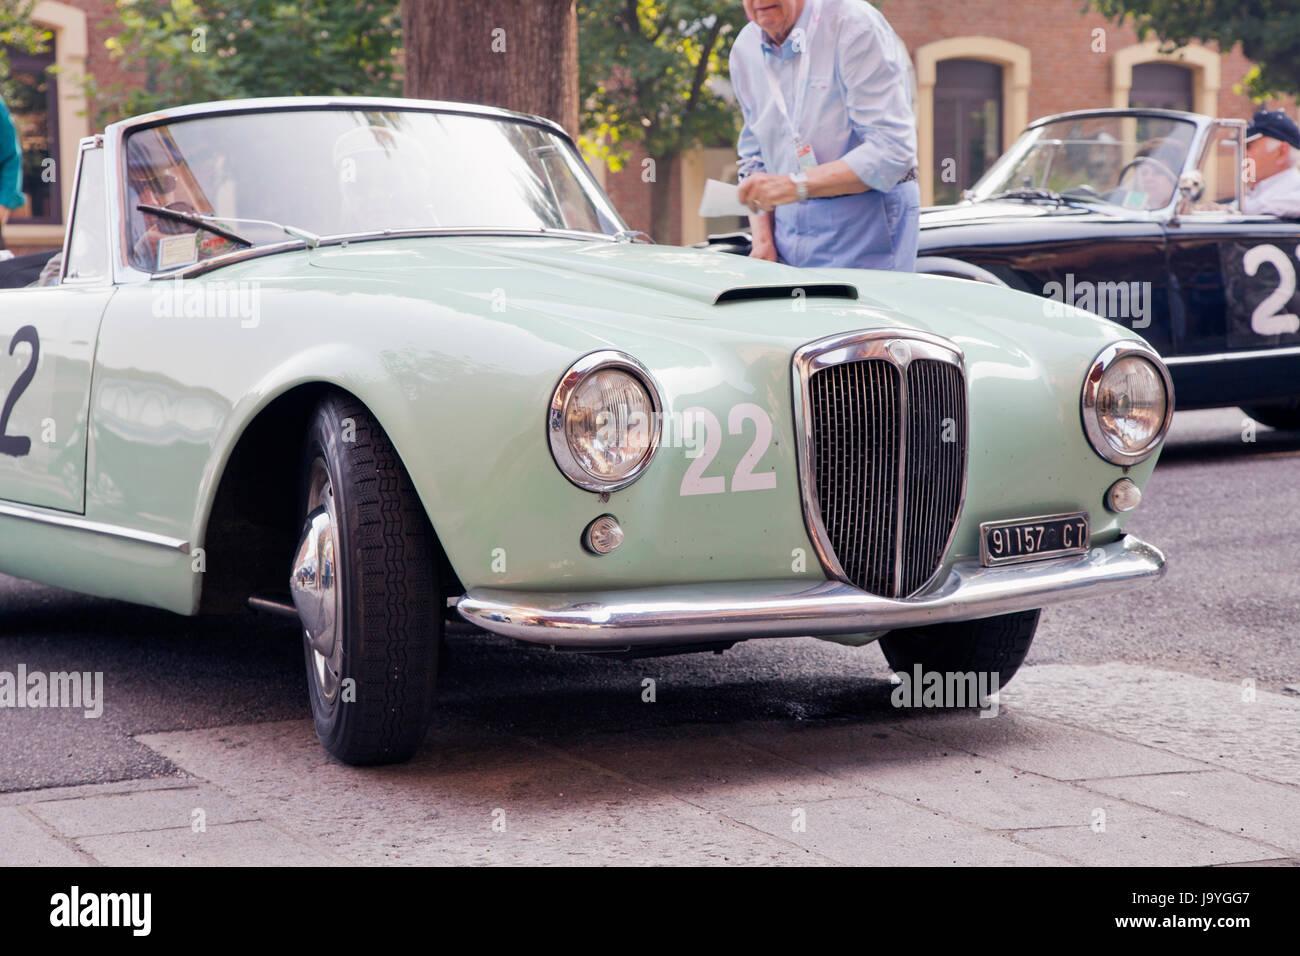 http://c8.alamy.com/comp/J9YGG7/casale-monferrato-italy-june-8-1956-lancia-aurelia-b-driven-by-carrera-J9YGG7.jpg